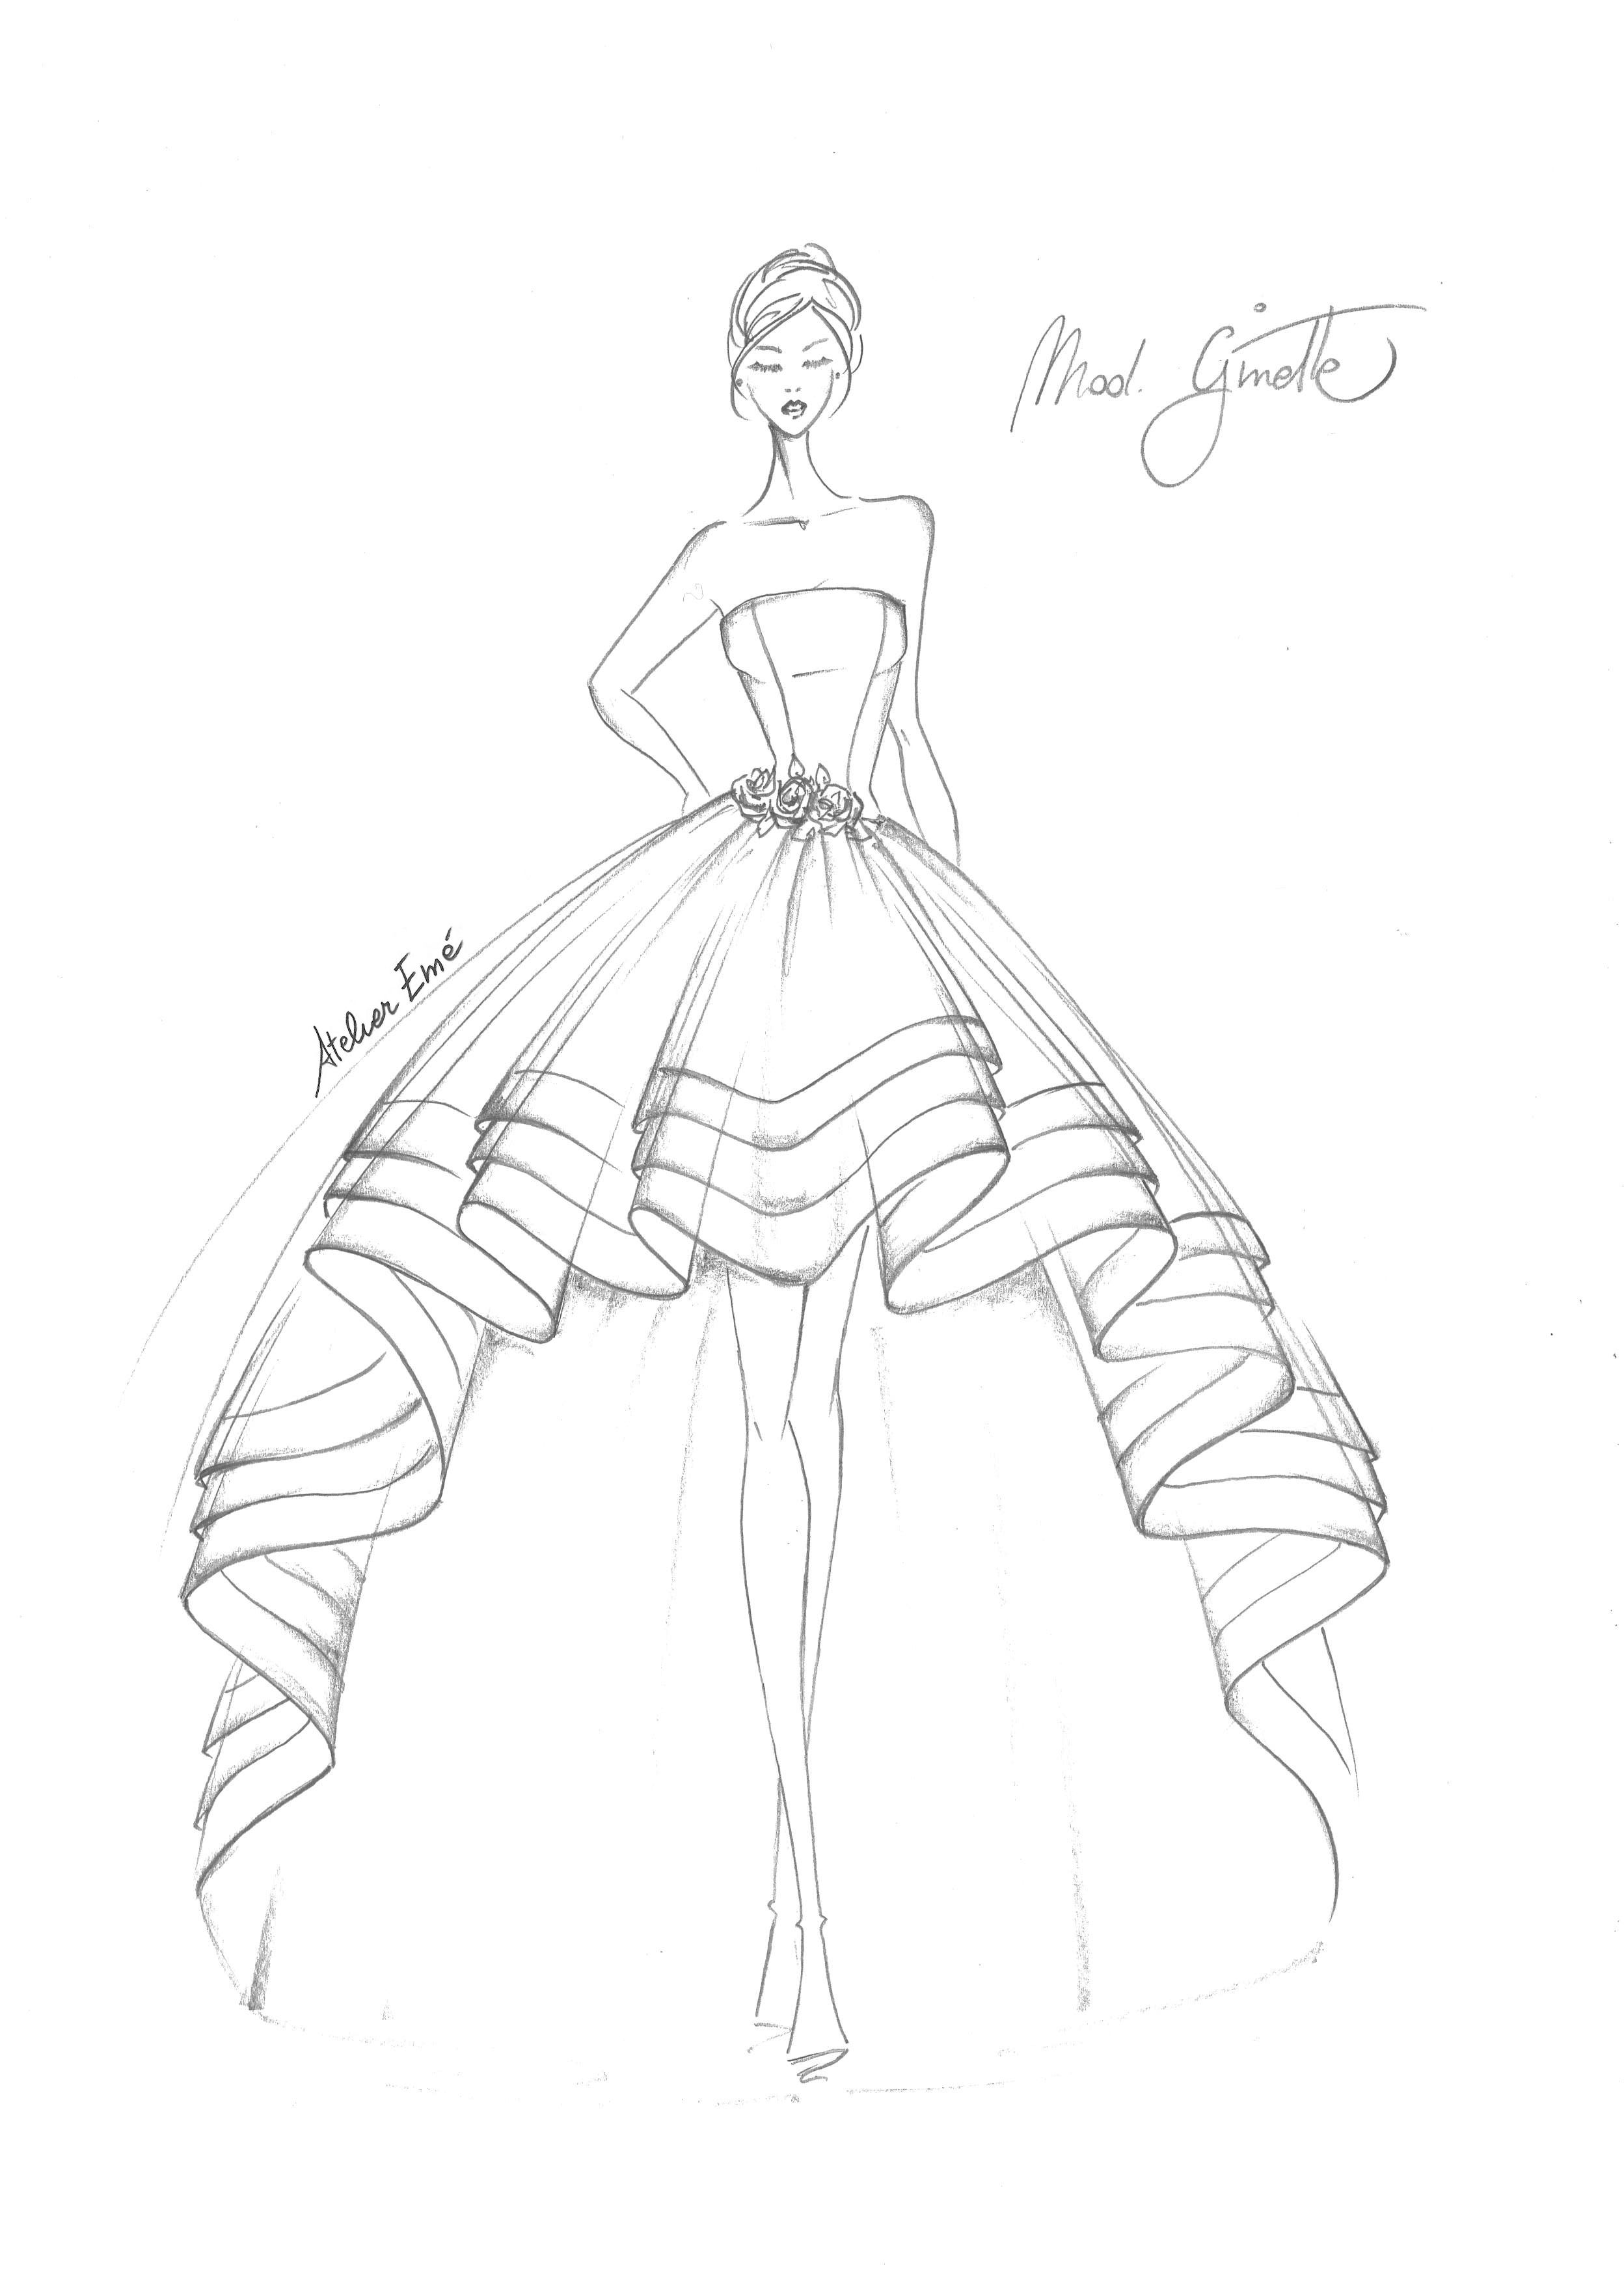 Ginette Atelier Em 233 深喜欢 Deep Love Fashion Sketches